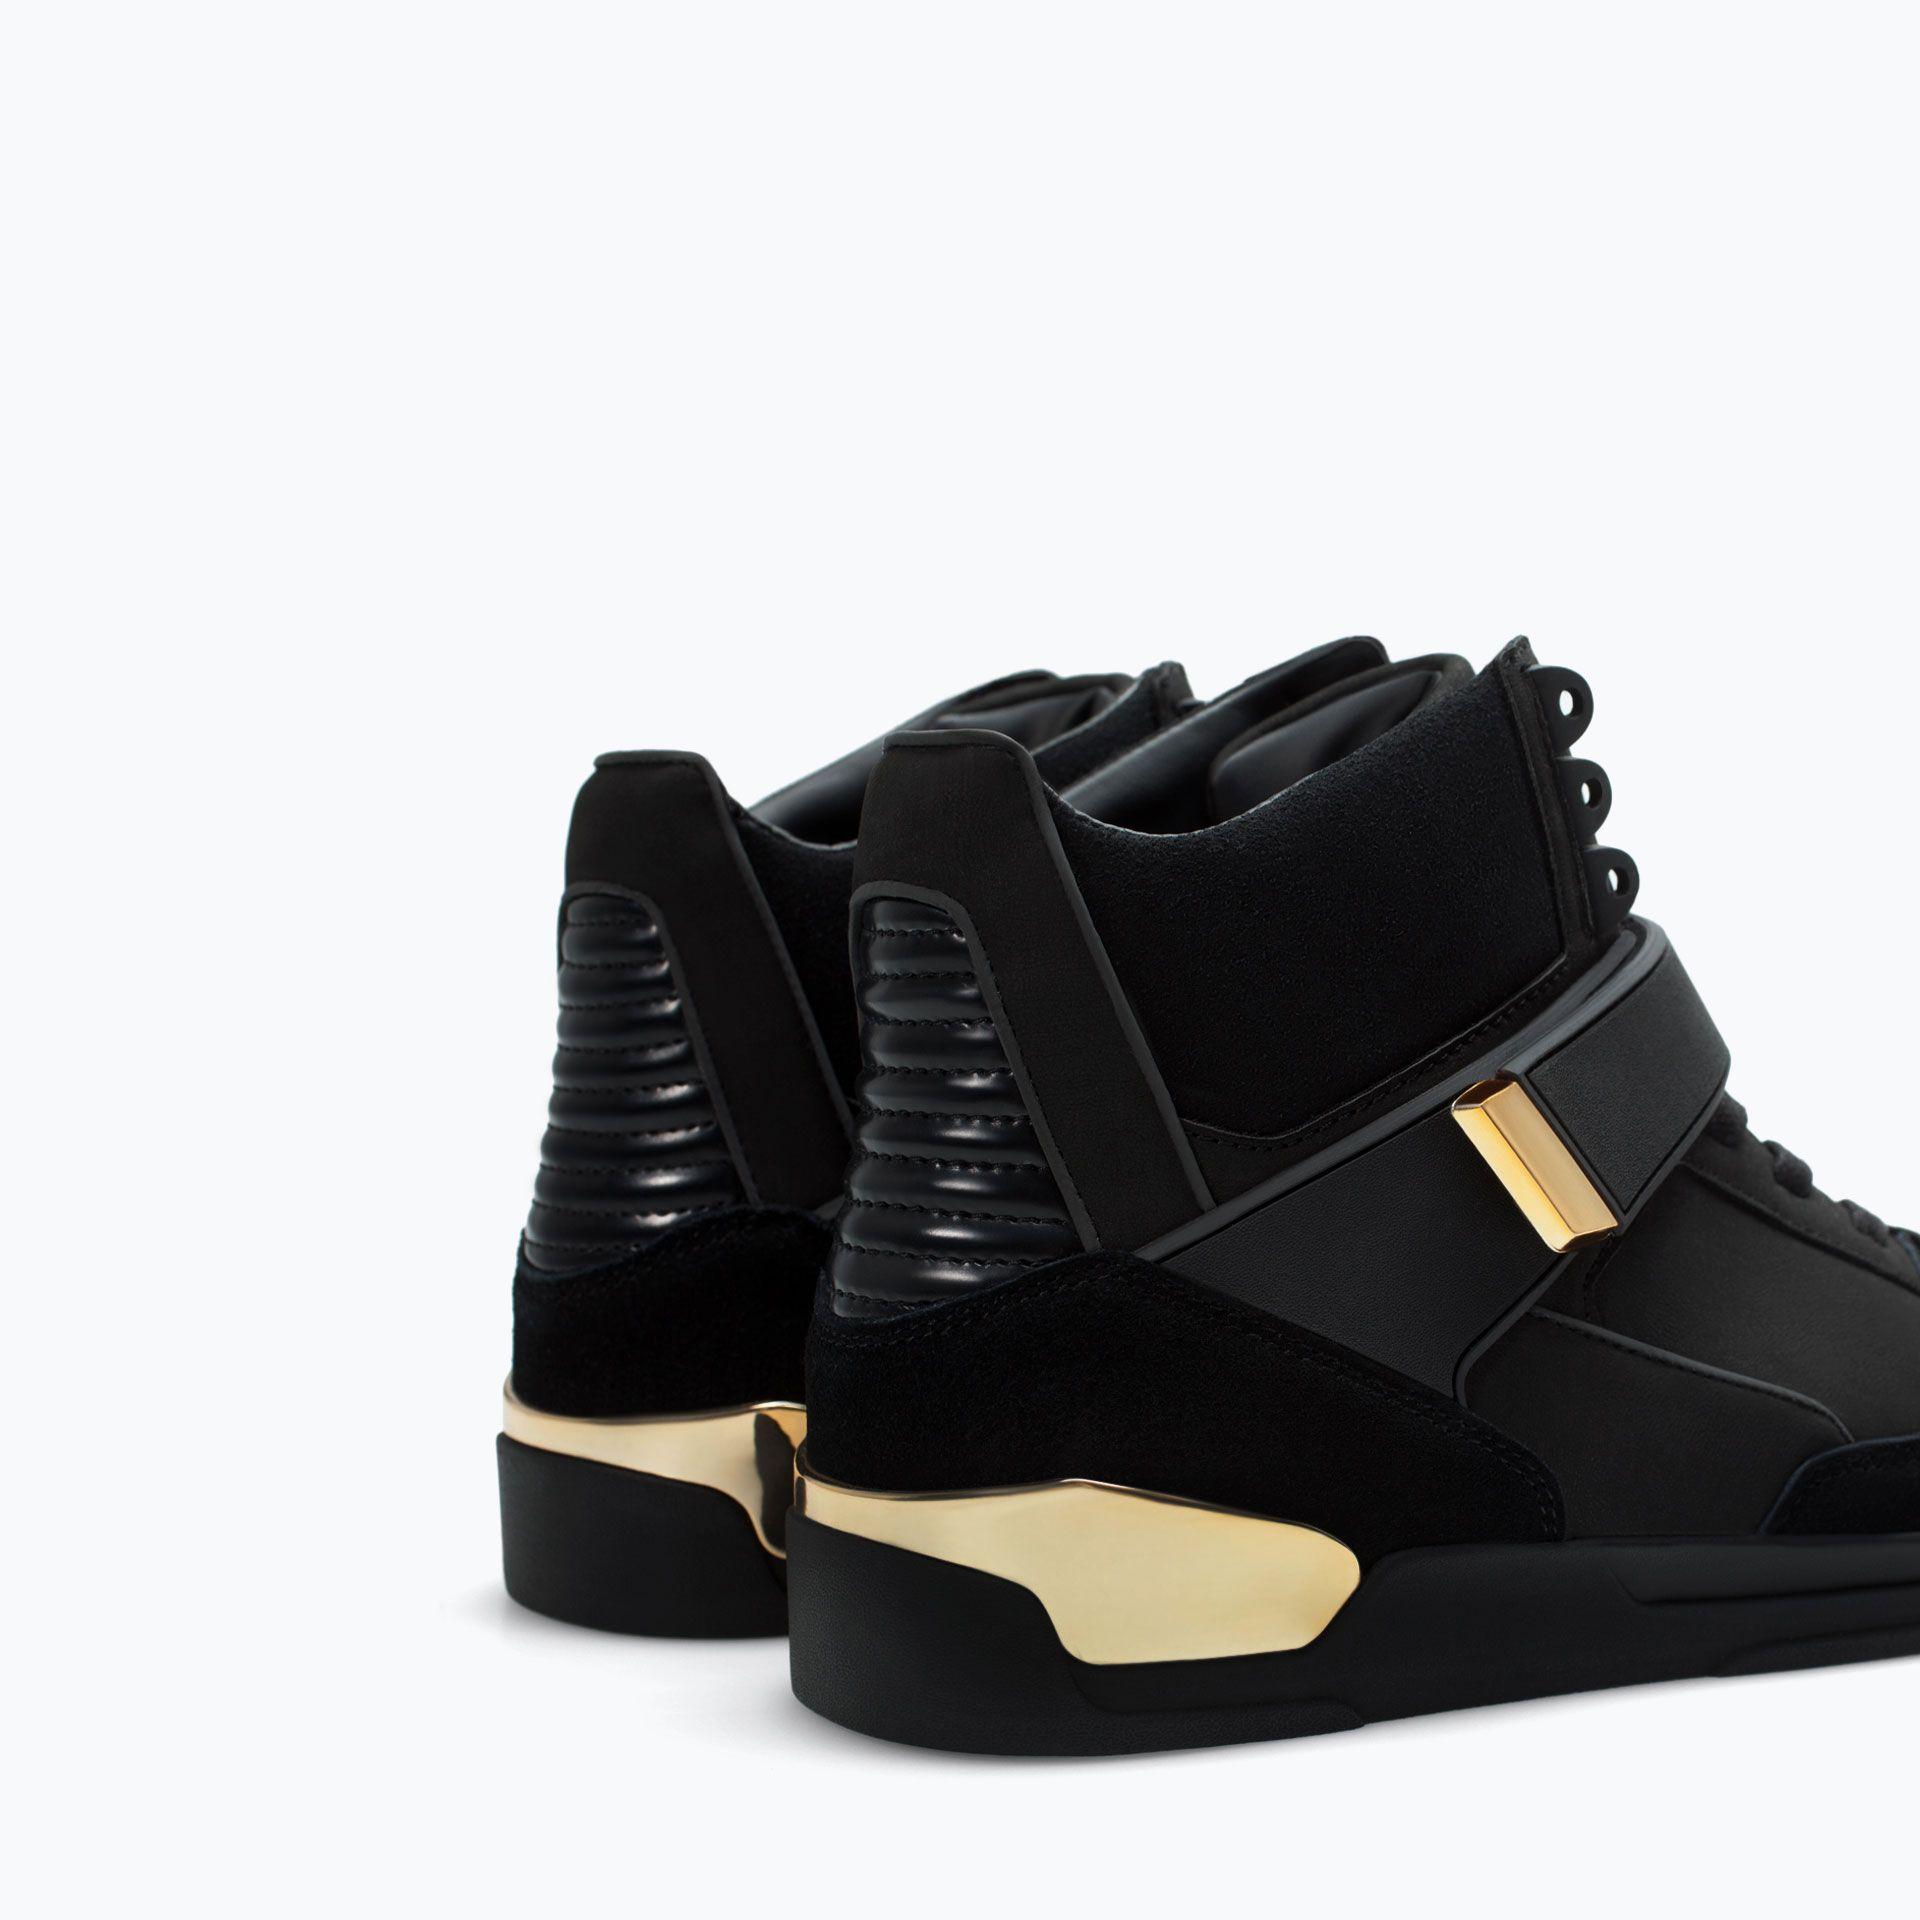 ZARA Hi-Top Sneaker With Metal Detail